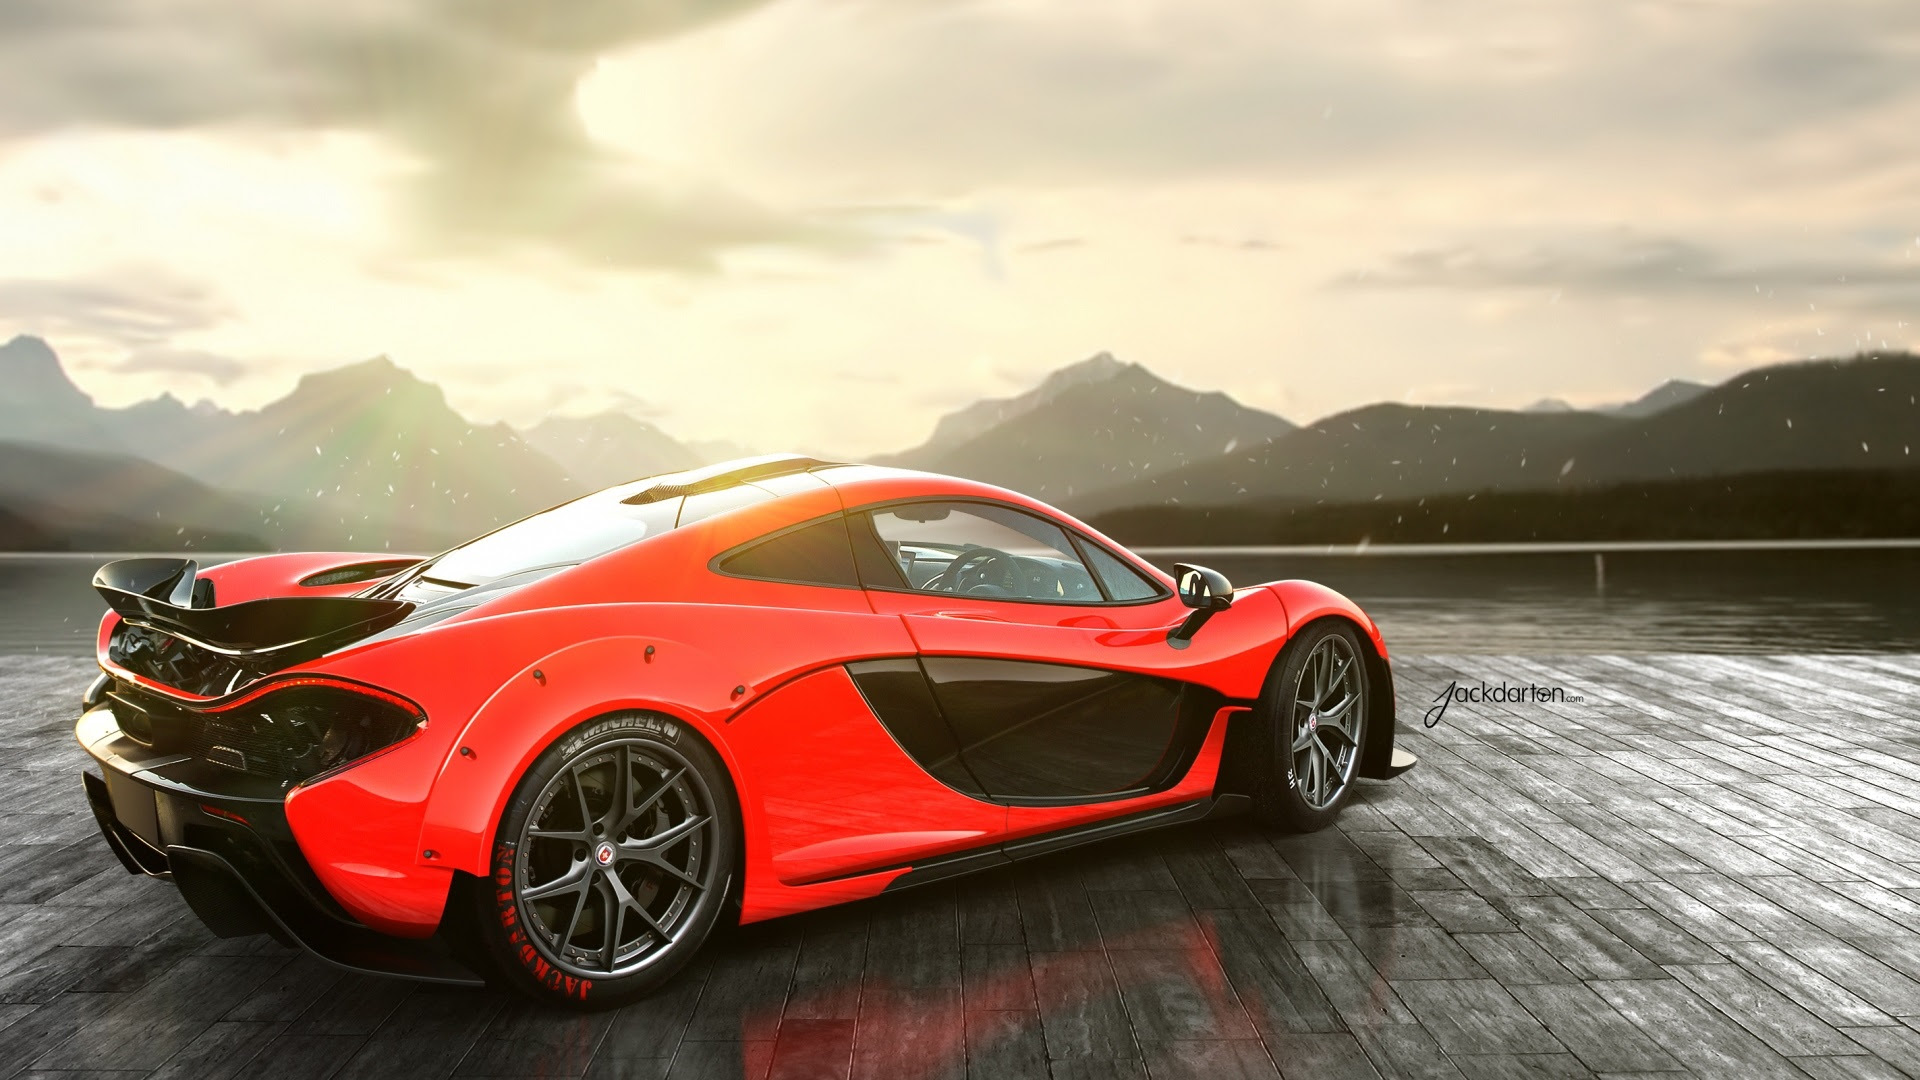 Awesome McLaren P1 Rear Wallpaper